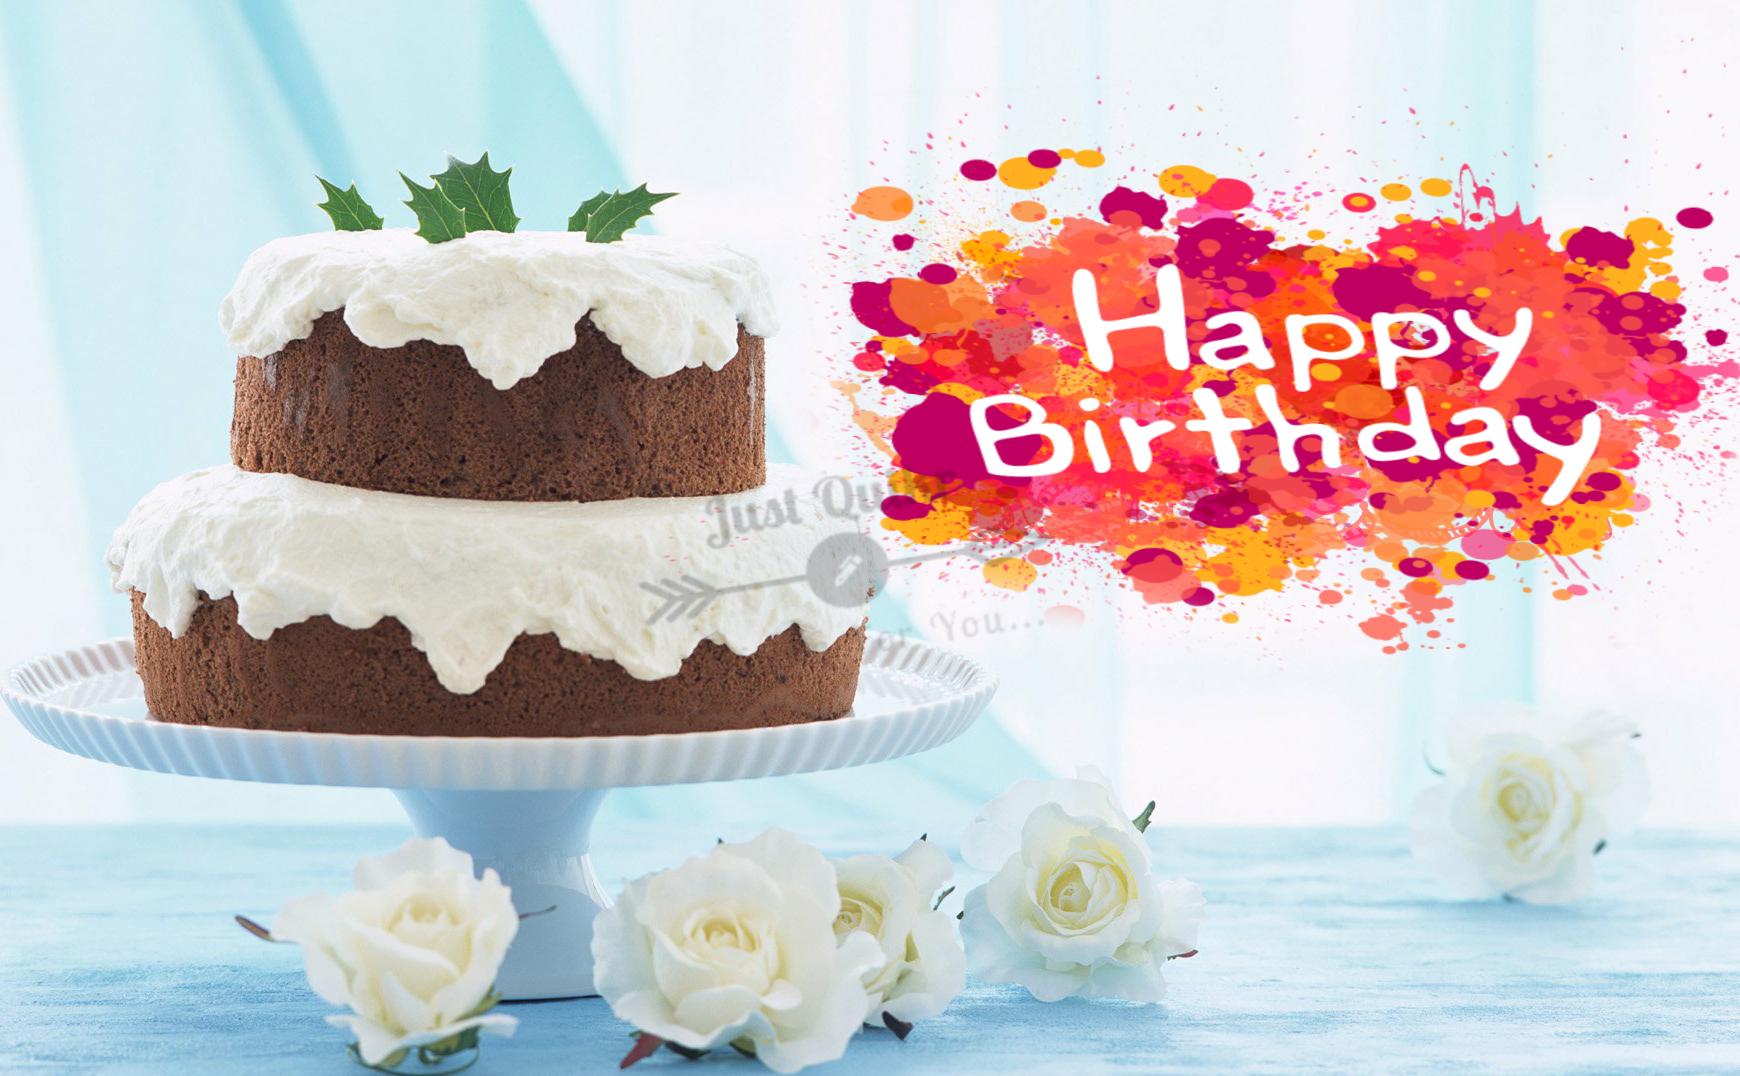 CreativeHappy Birthday Wishing Cake Status Images for Islamic Relatives